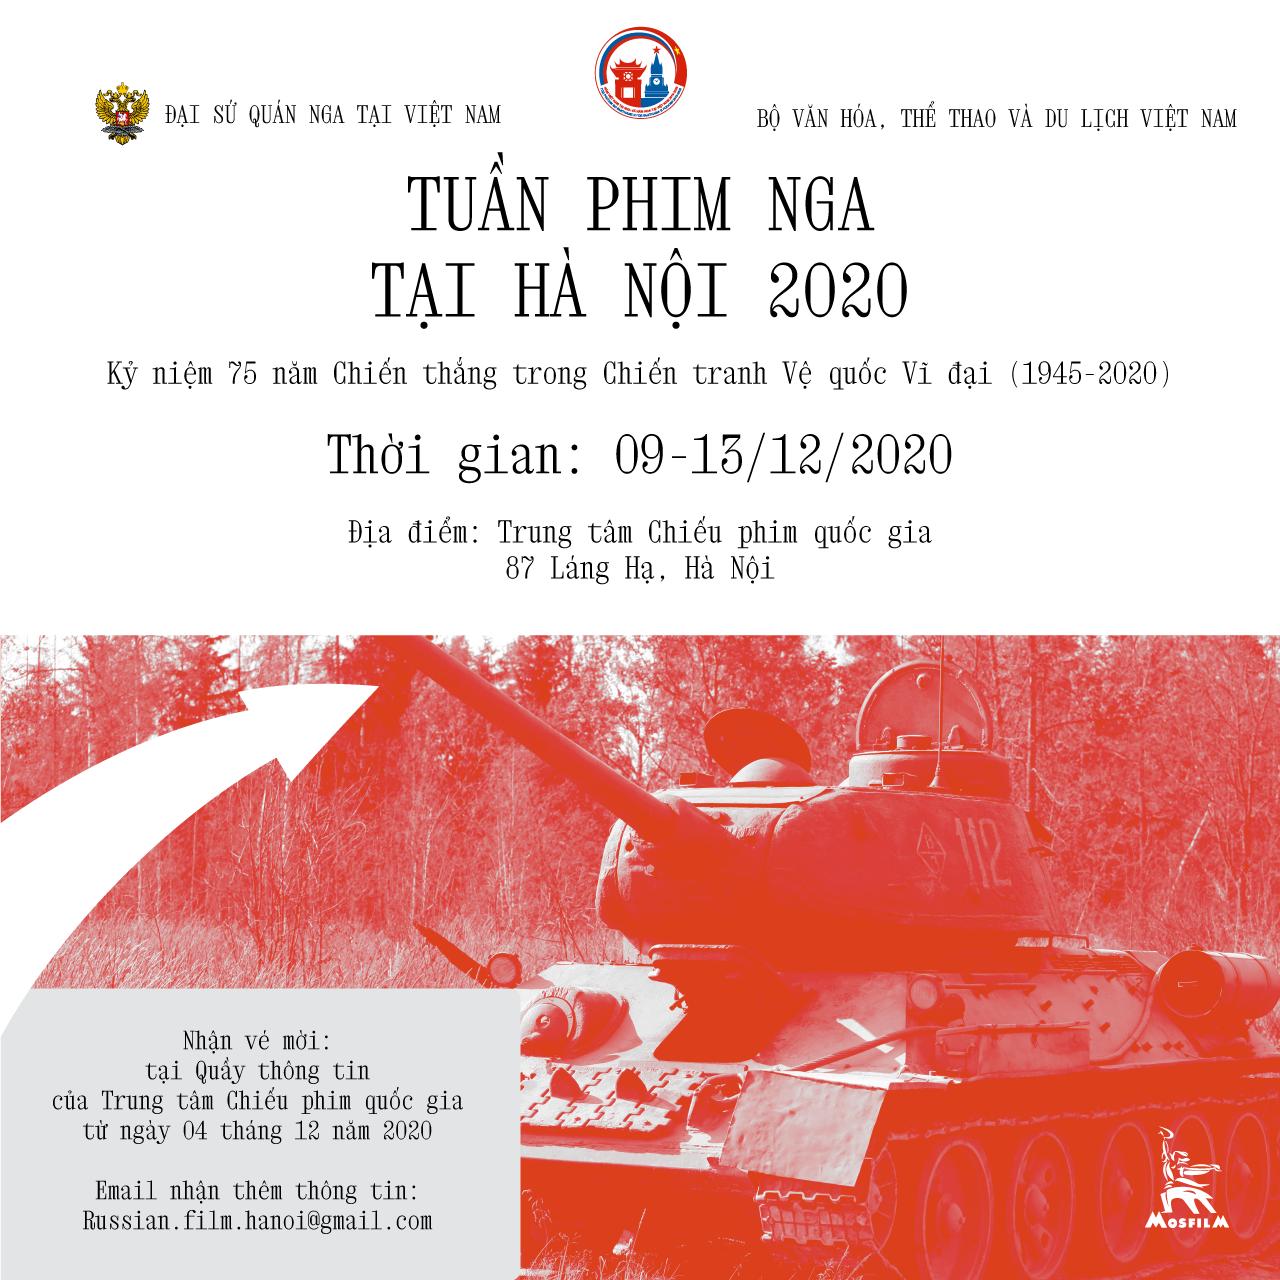 russian film week backs in vietnam